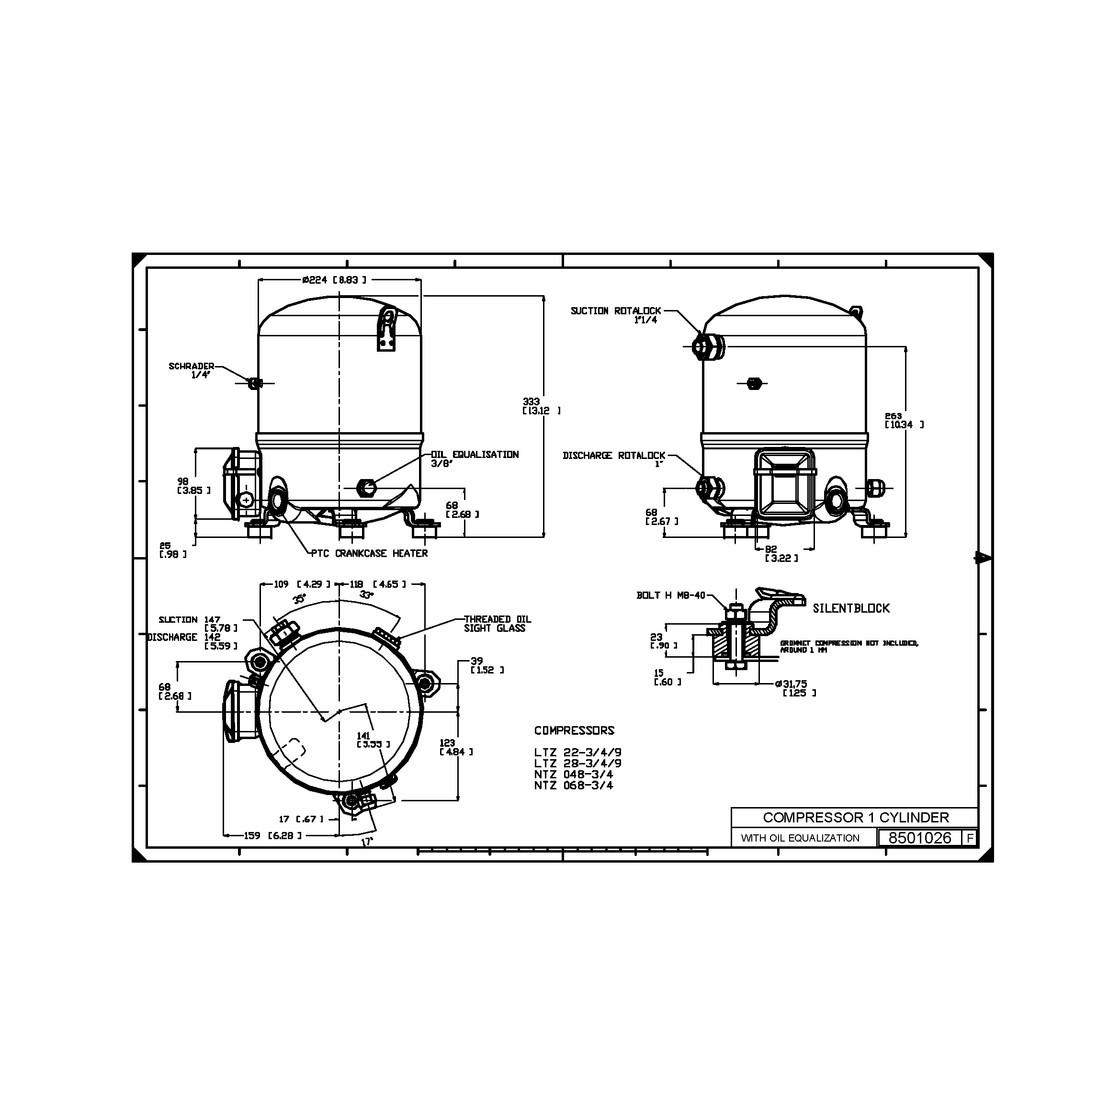 Maneurop Compressor Wiring Diagram on